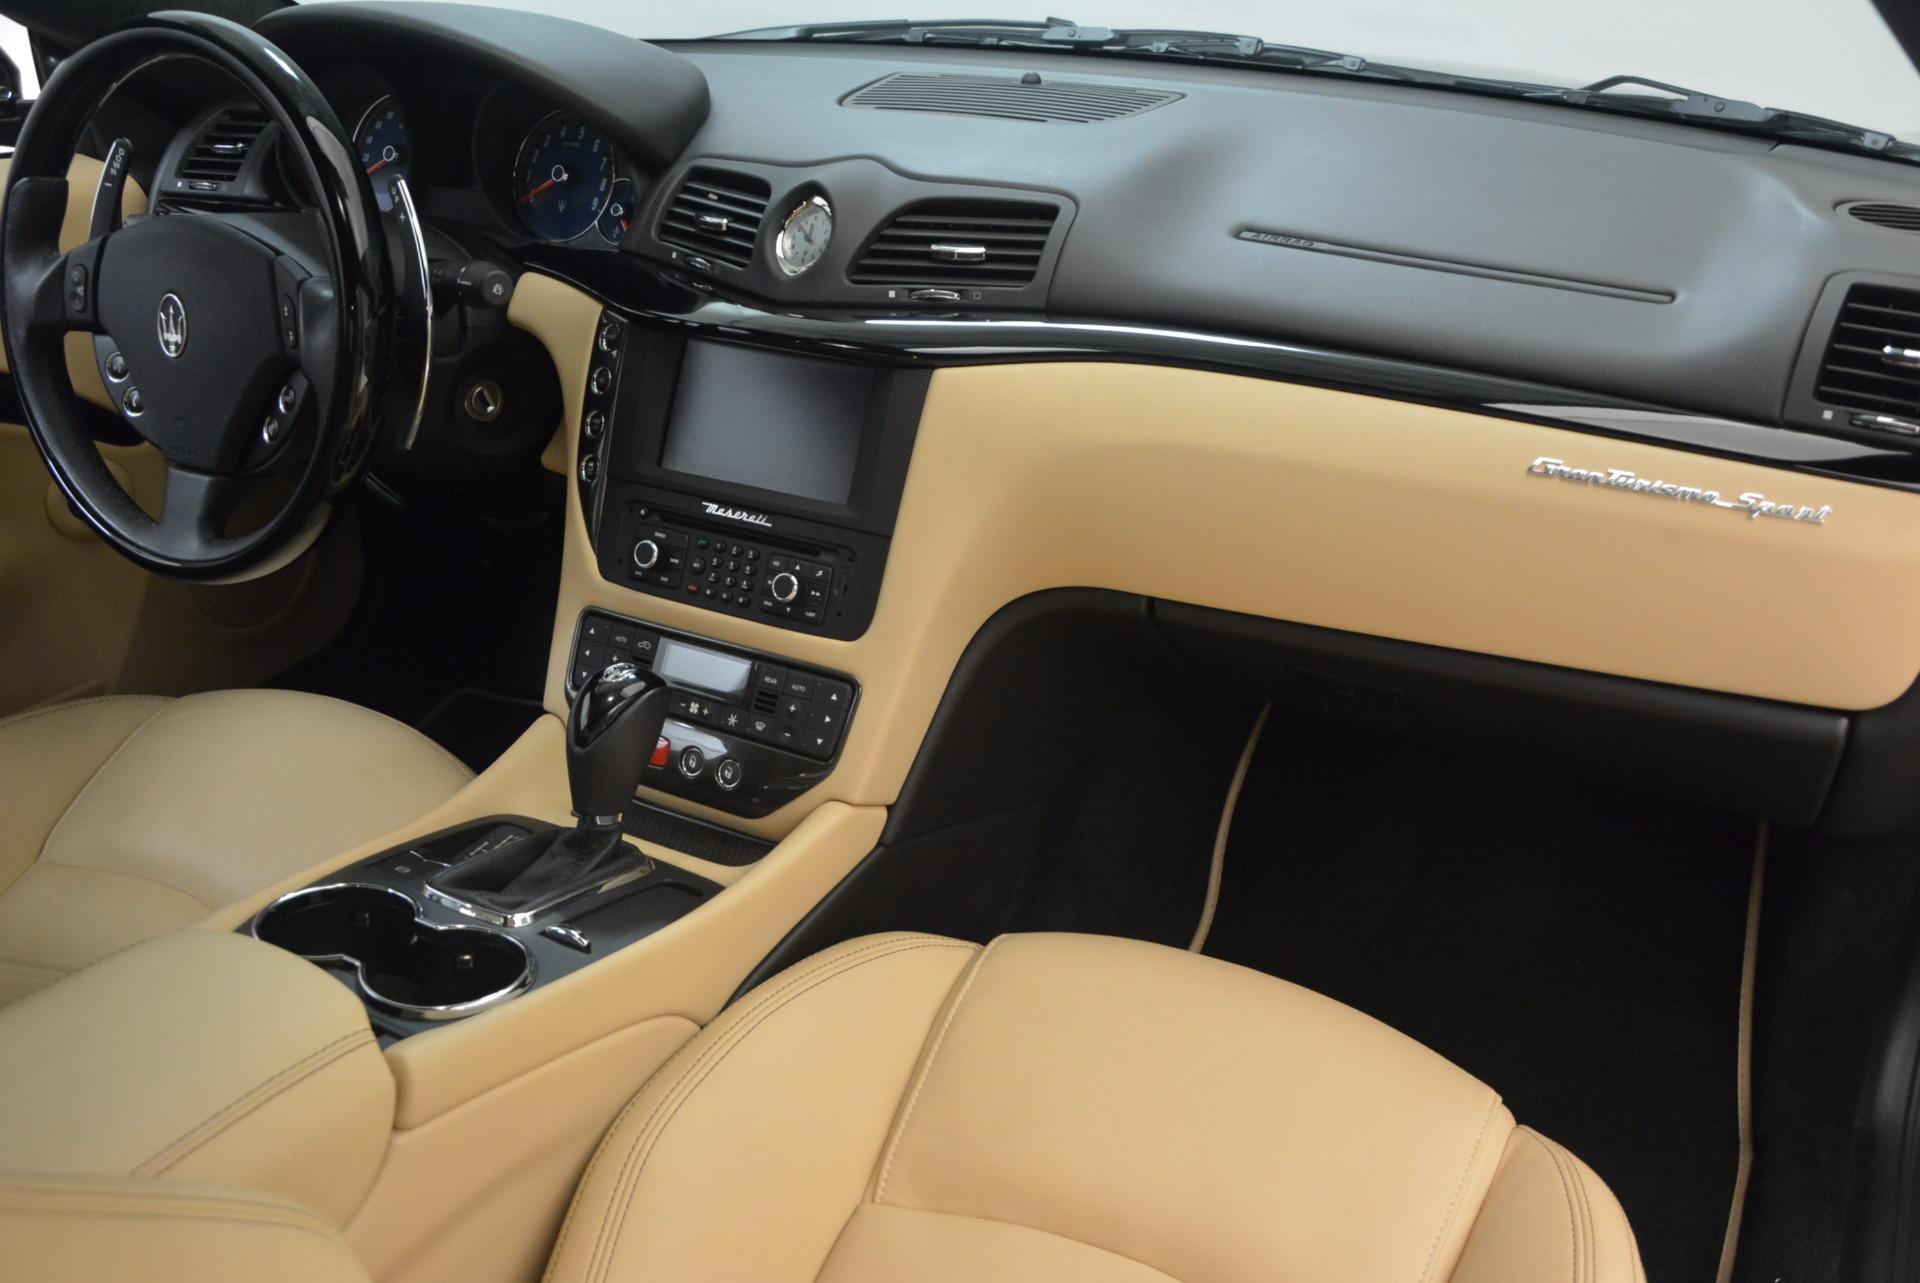 Used 2015 Maserati GranTurismo Sport Coupe For Sale In Westport, CT 1557_p22